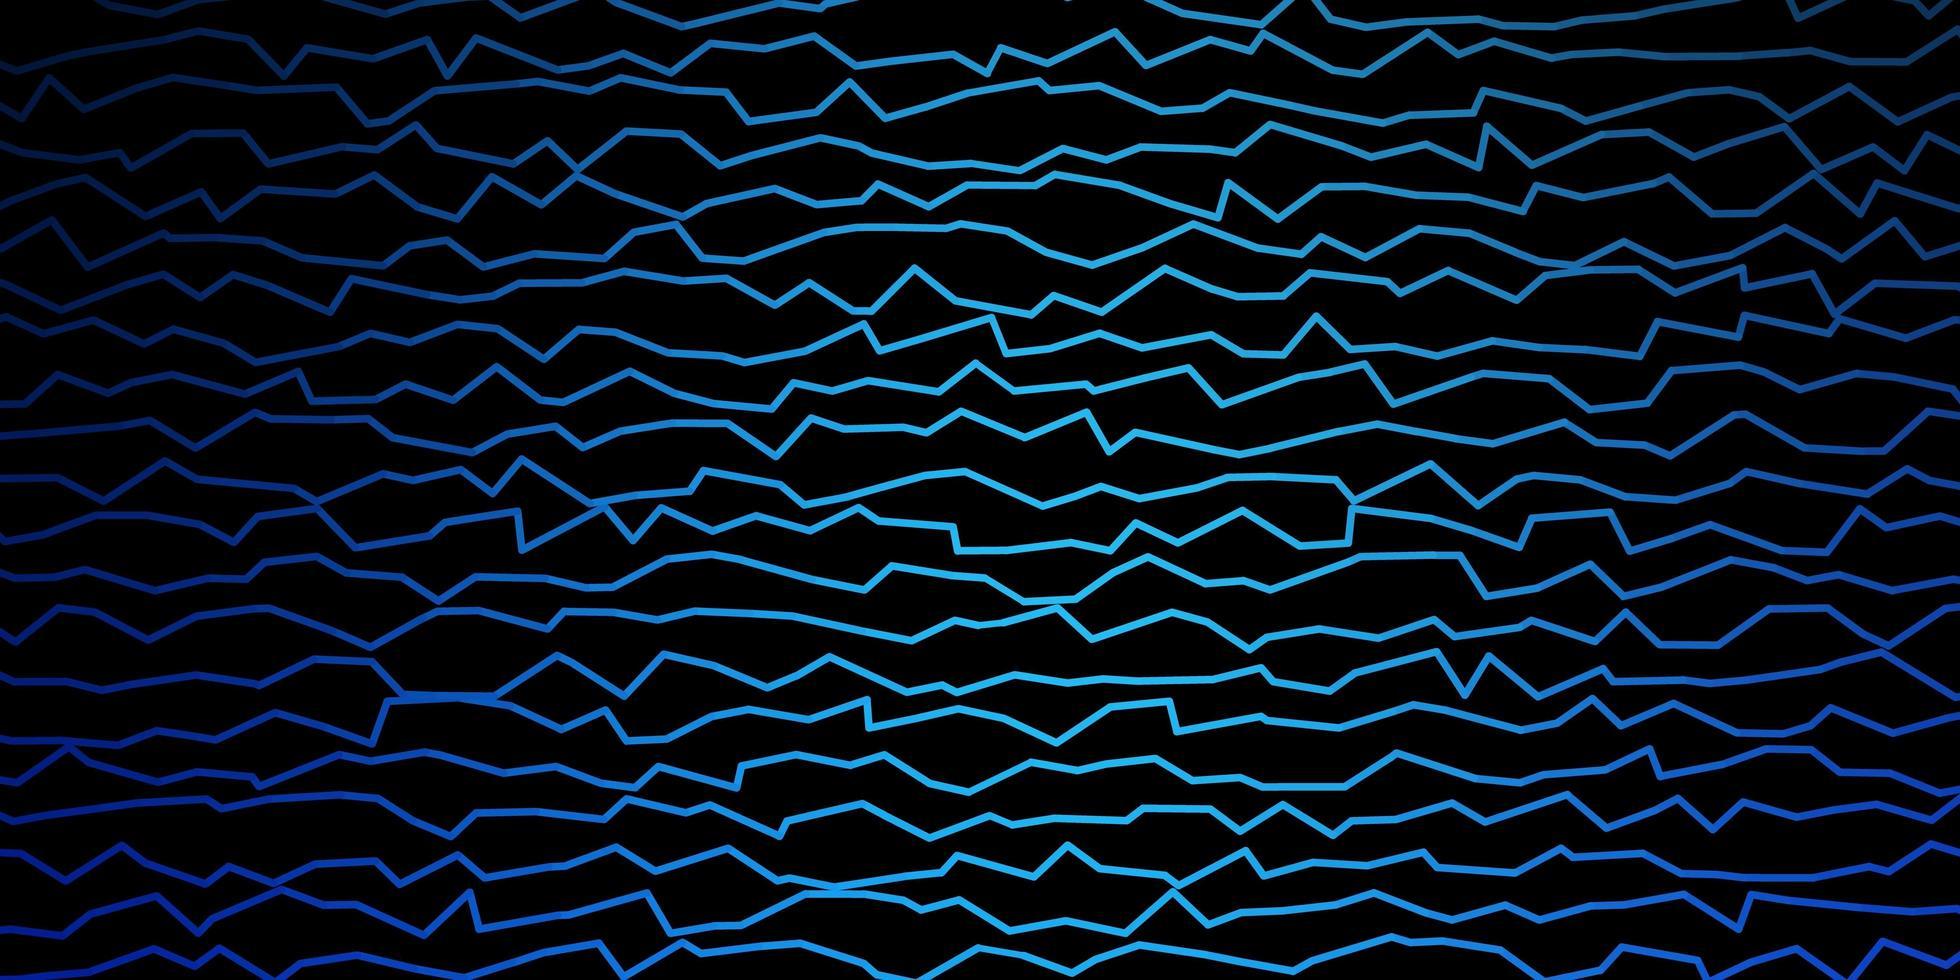 Dark BLUE vector texture with curves